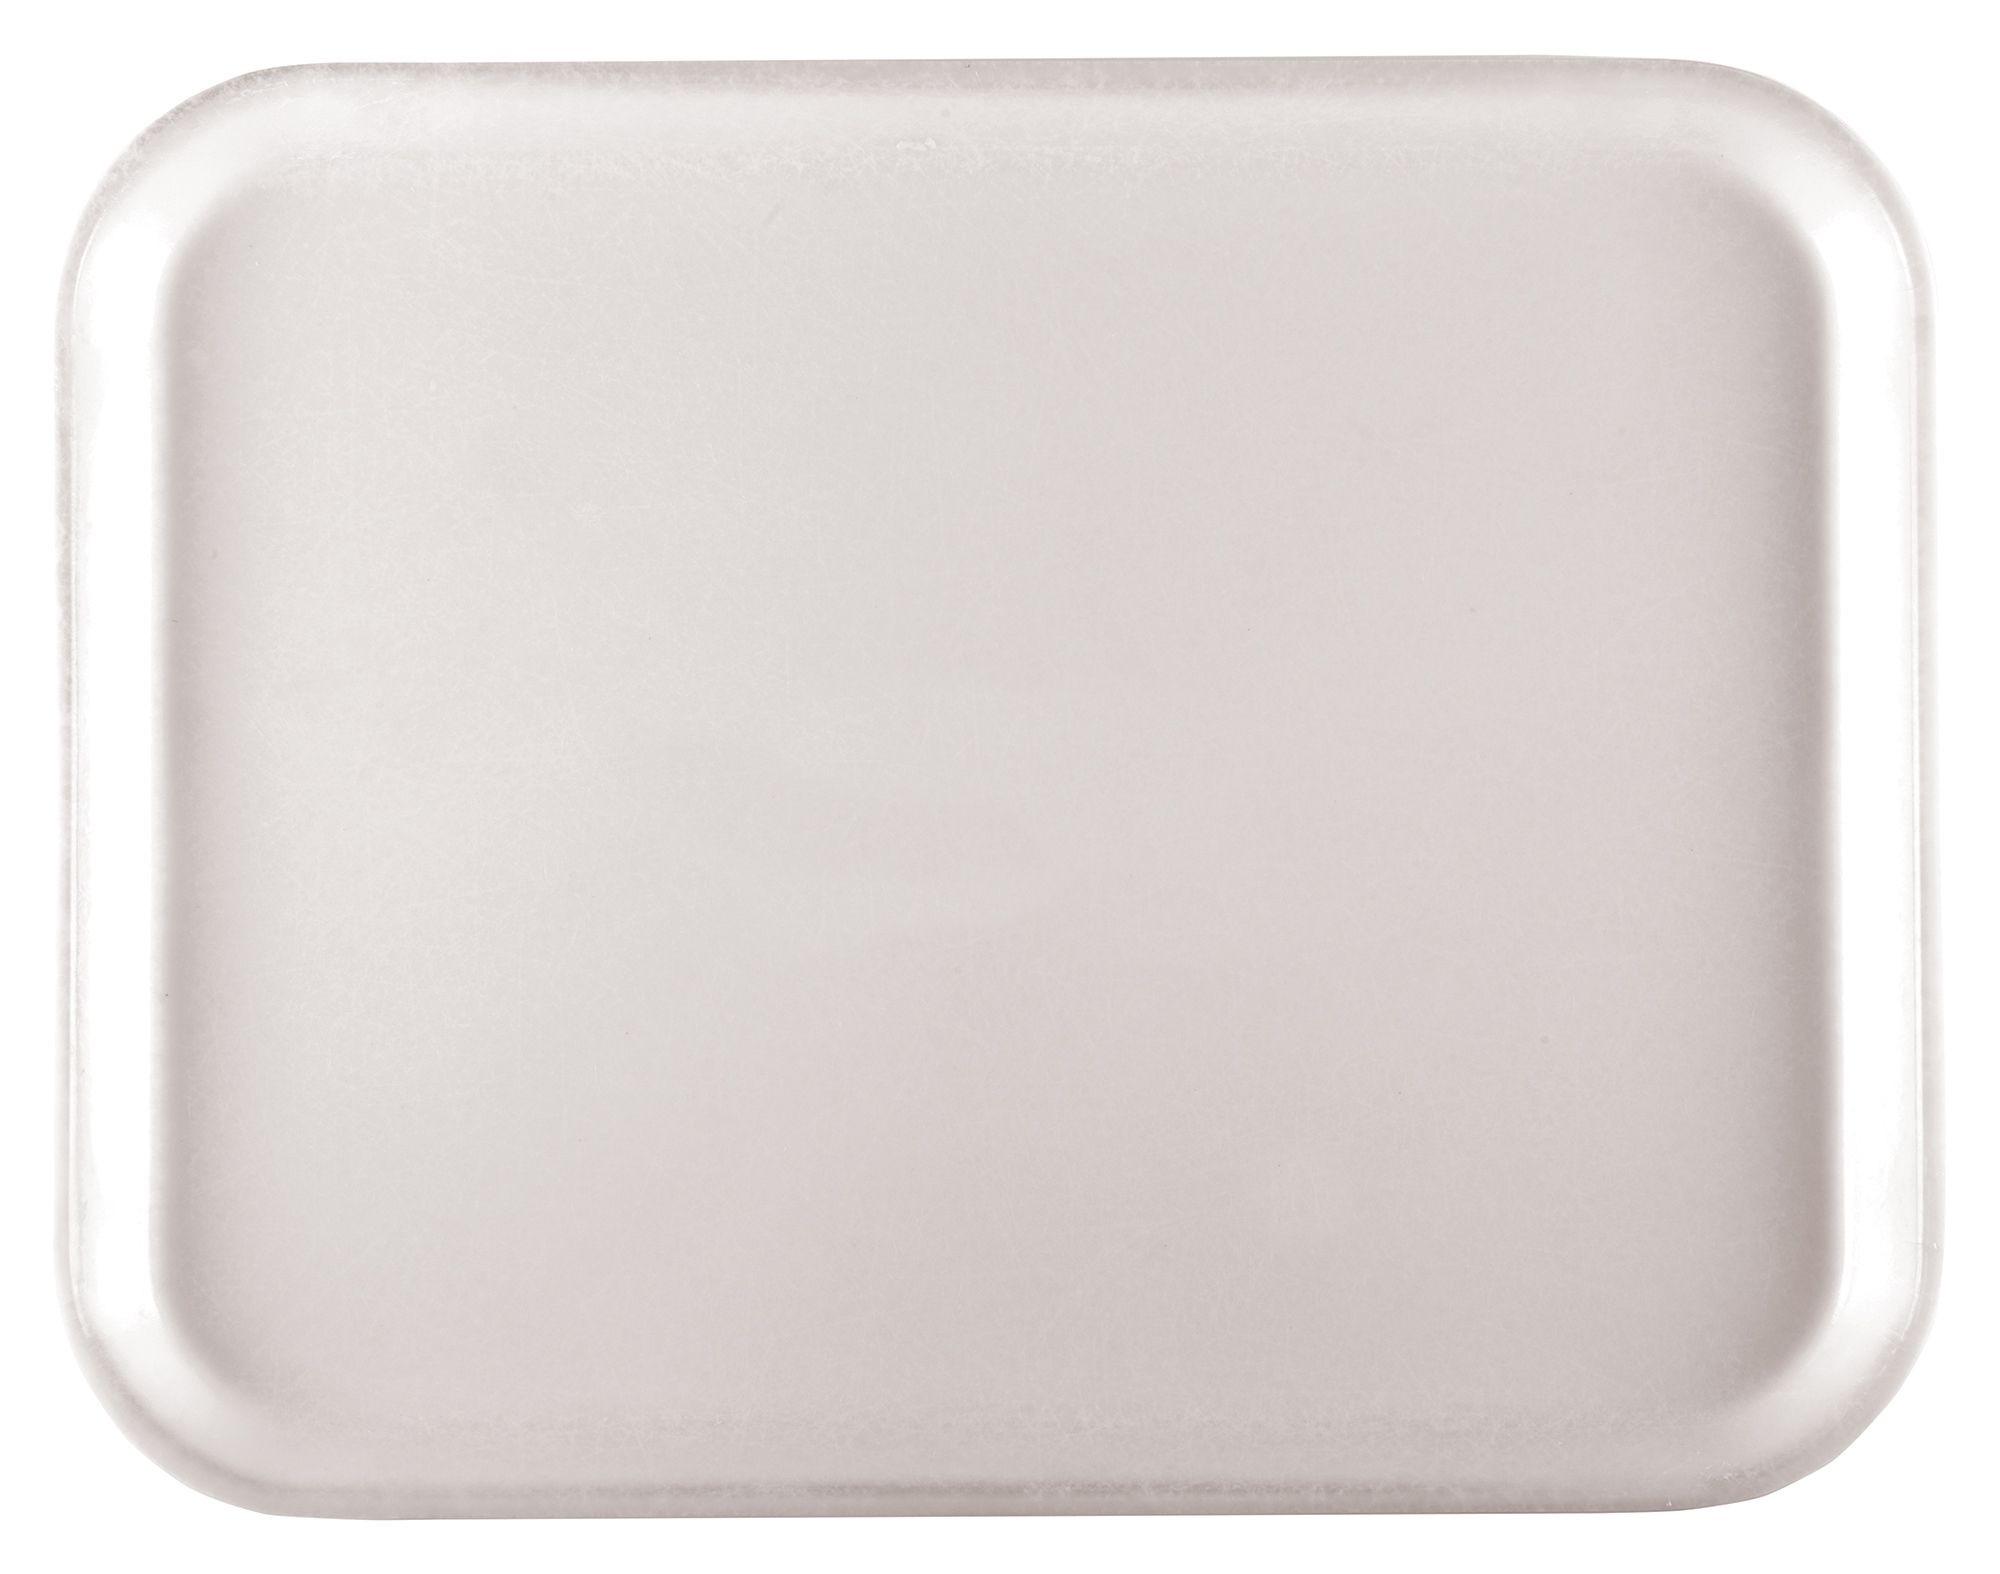 "Winco FGT-1216W Fiberglass Rectangular Tray, White, 12"" x 16"""